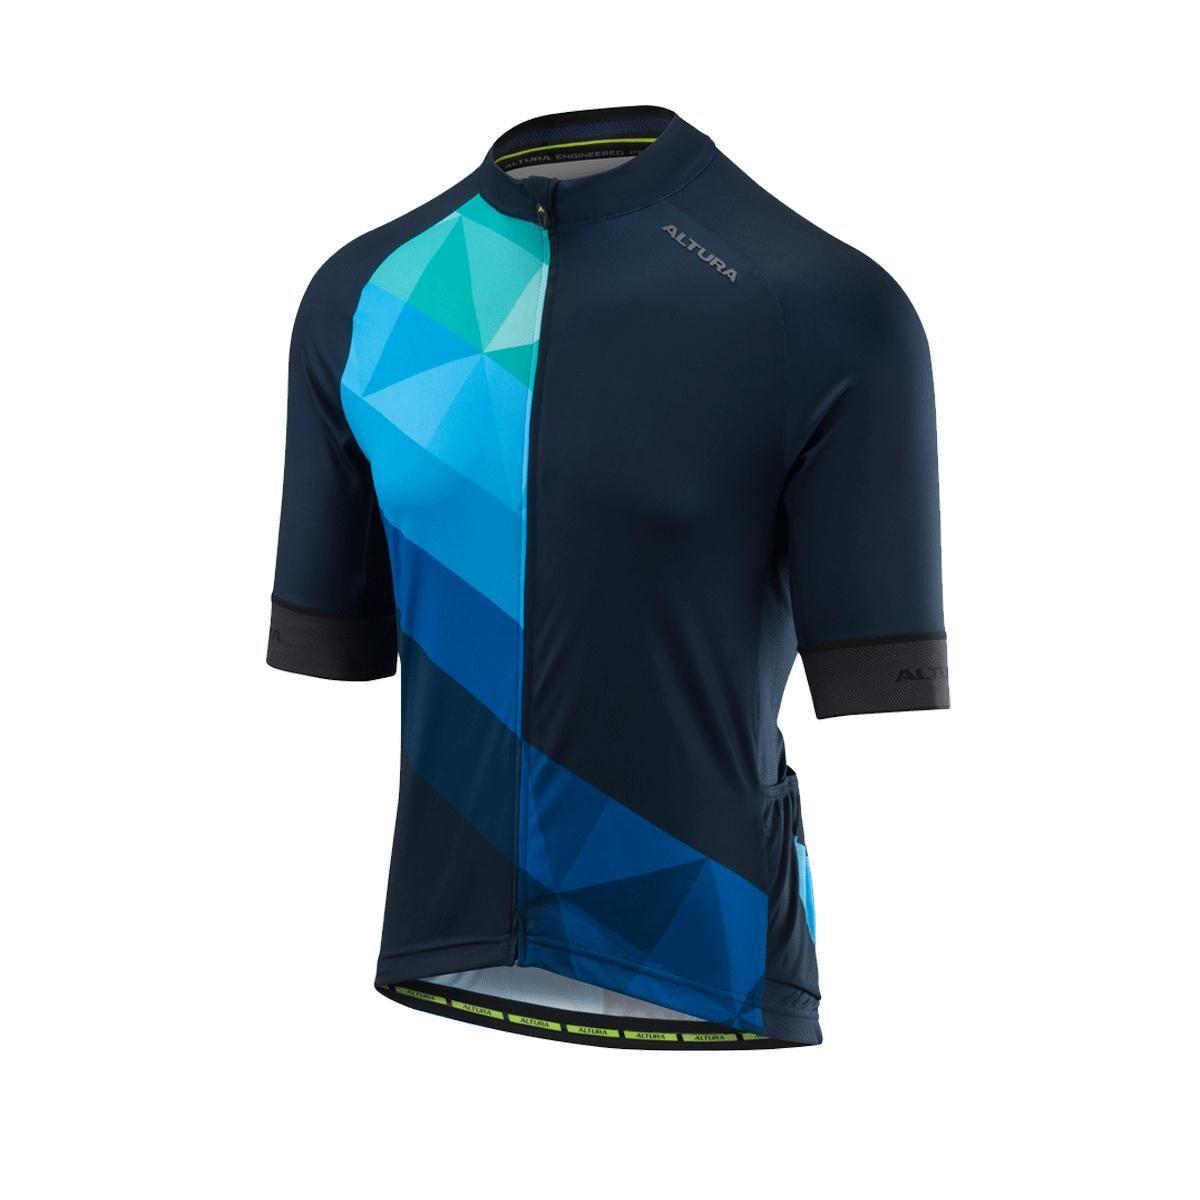 Altura Peloton Short Sleeve Jersey Mosaic 2018: Mosaic Blue/Black L